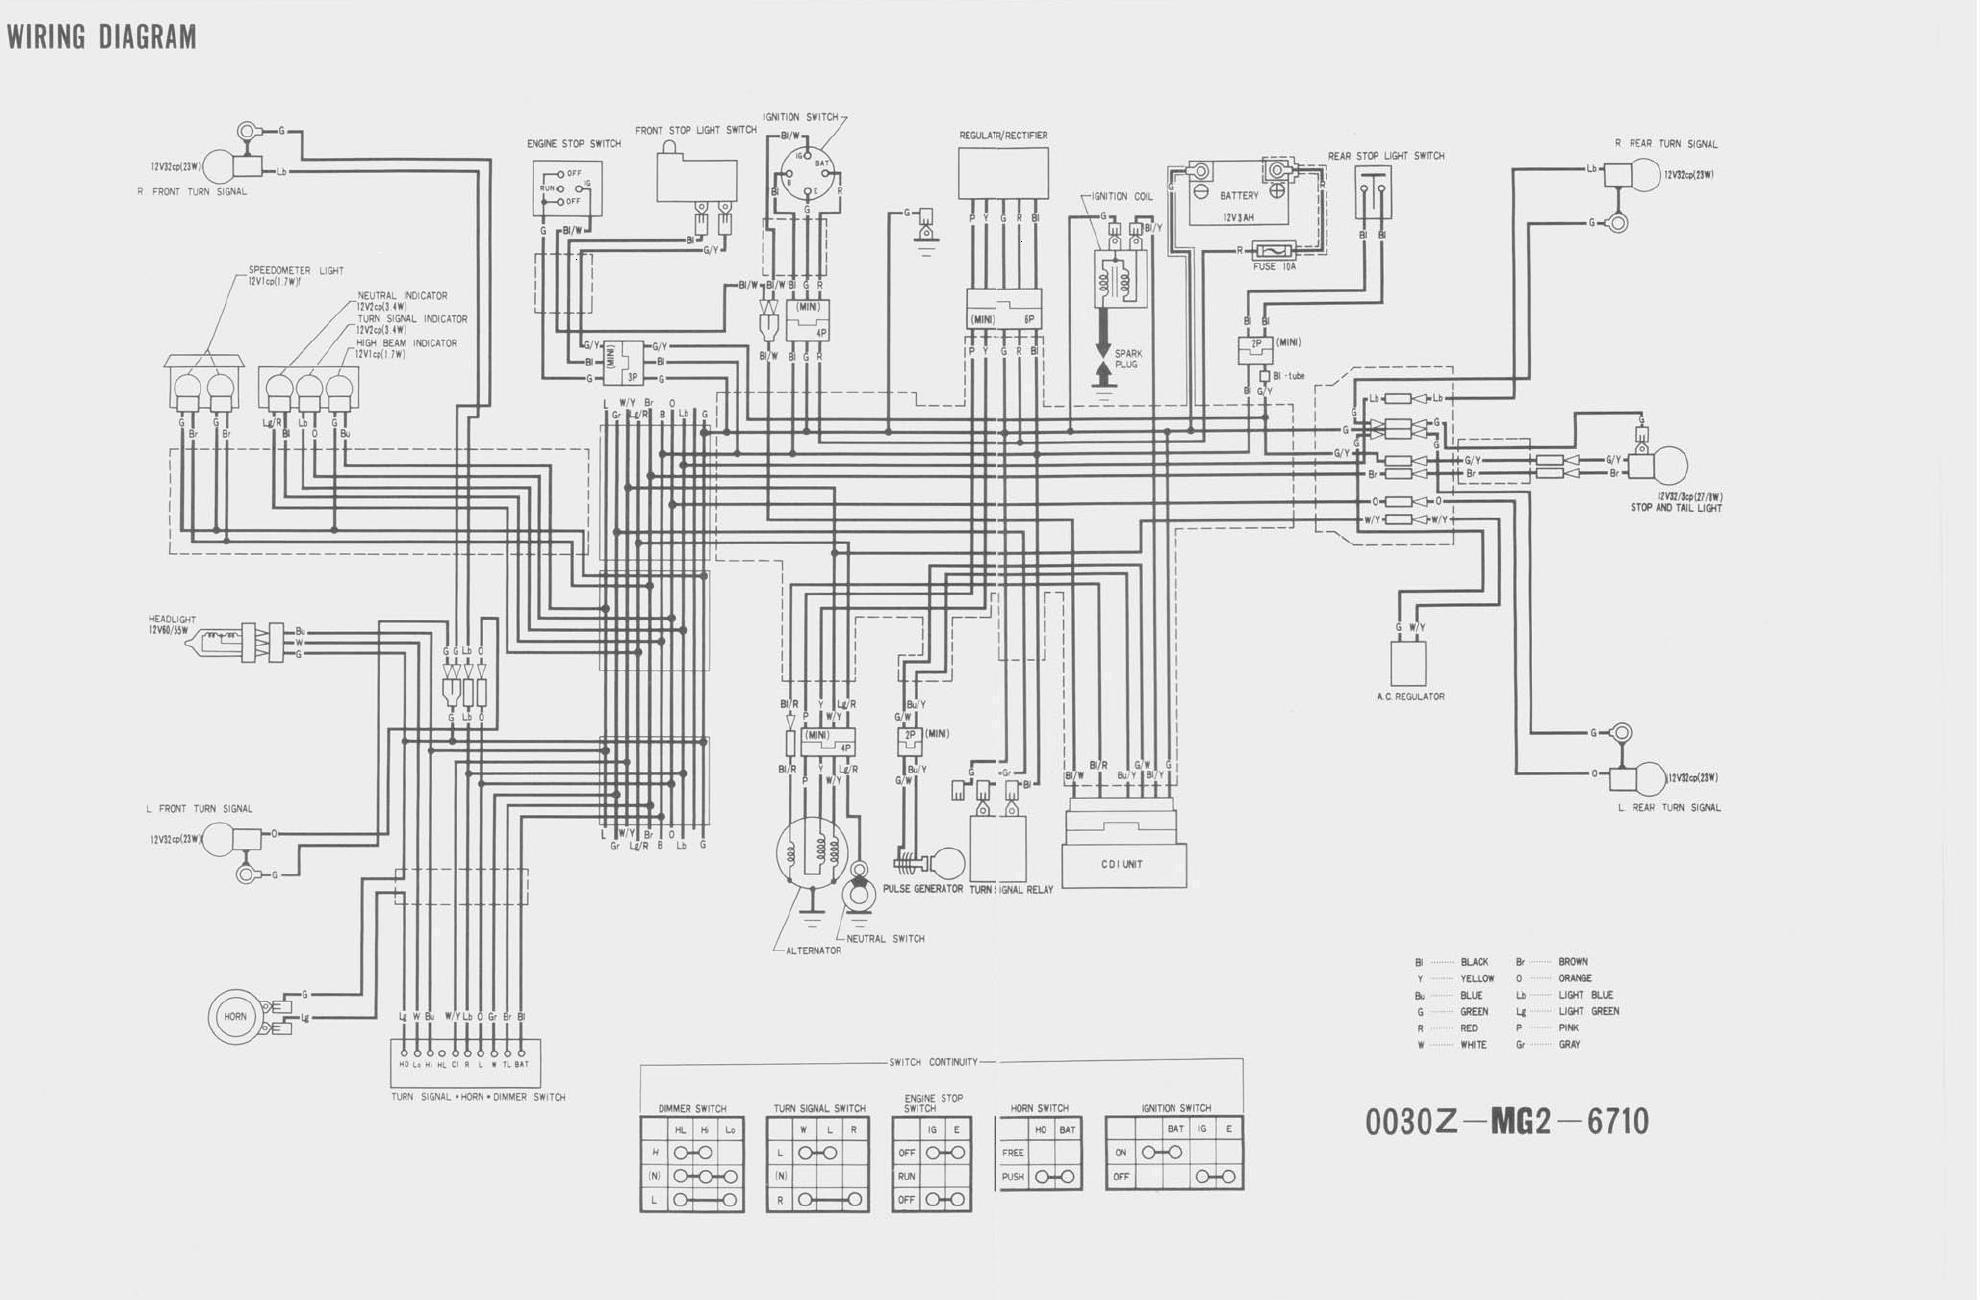 Wiring Diagram Creator Free : Honda eu i generator wiring diagram free download